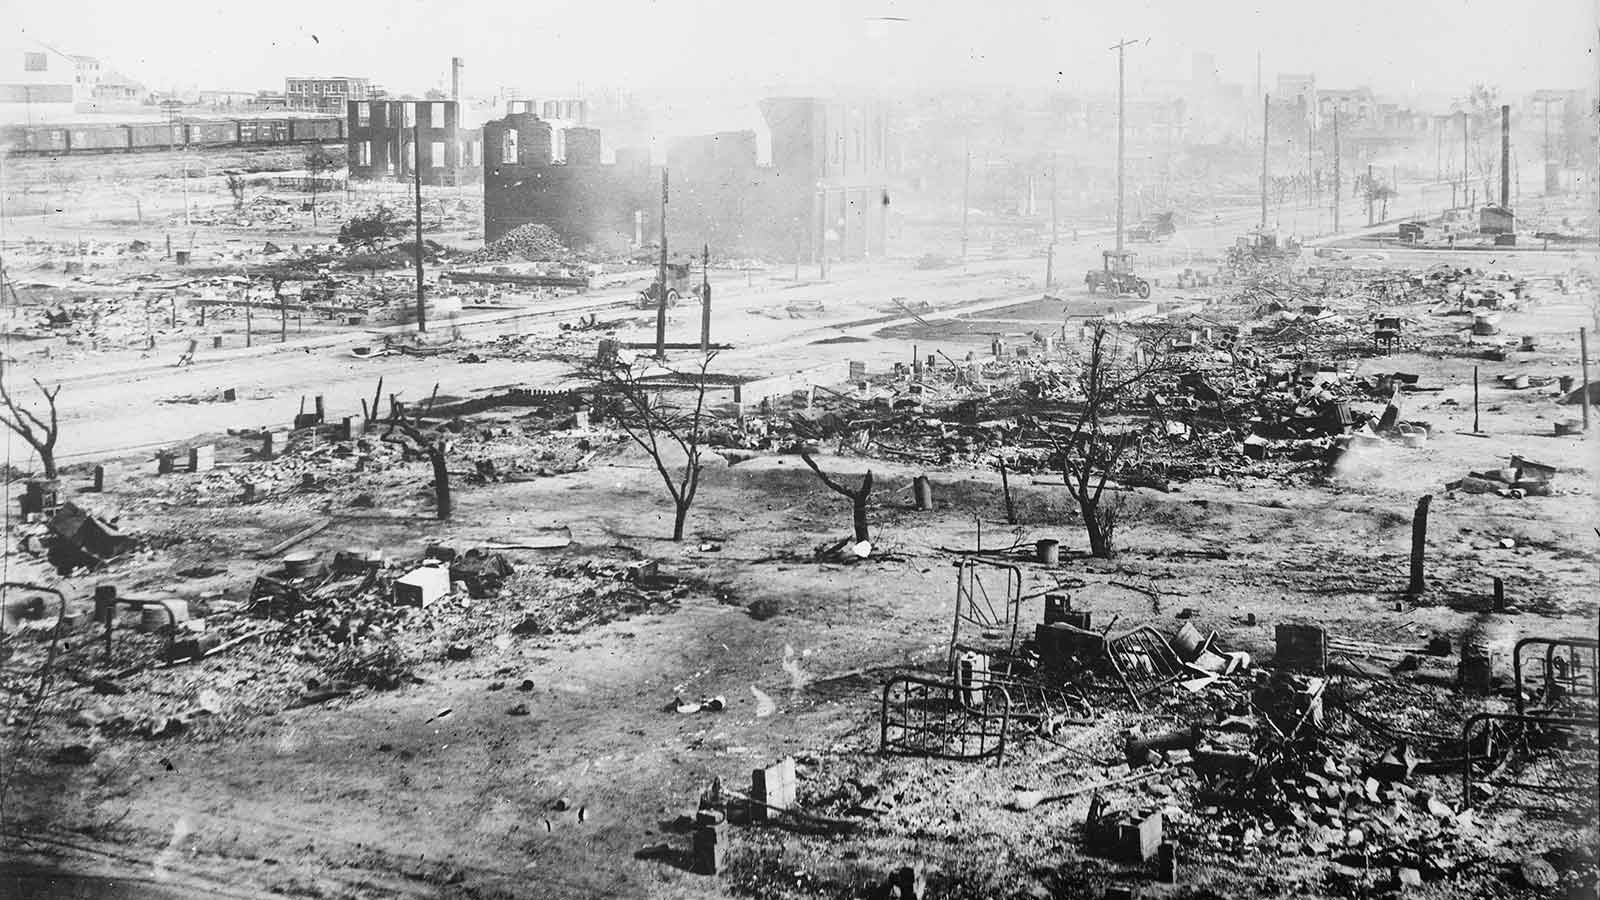 Reparations bill for Tulsa Race Massacre survivors introduced in Congress